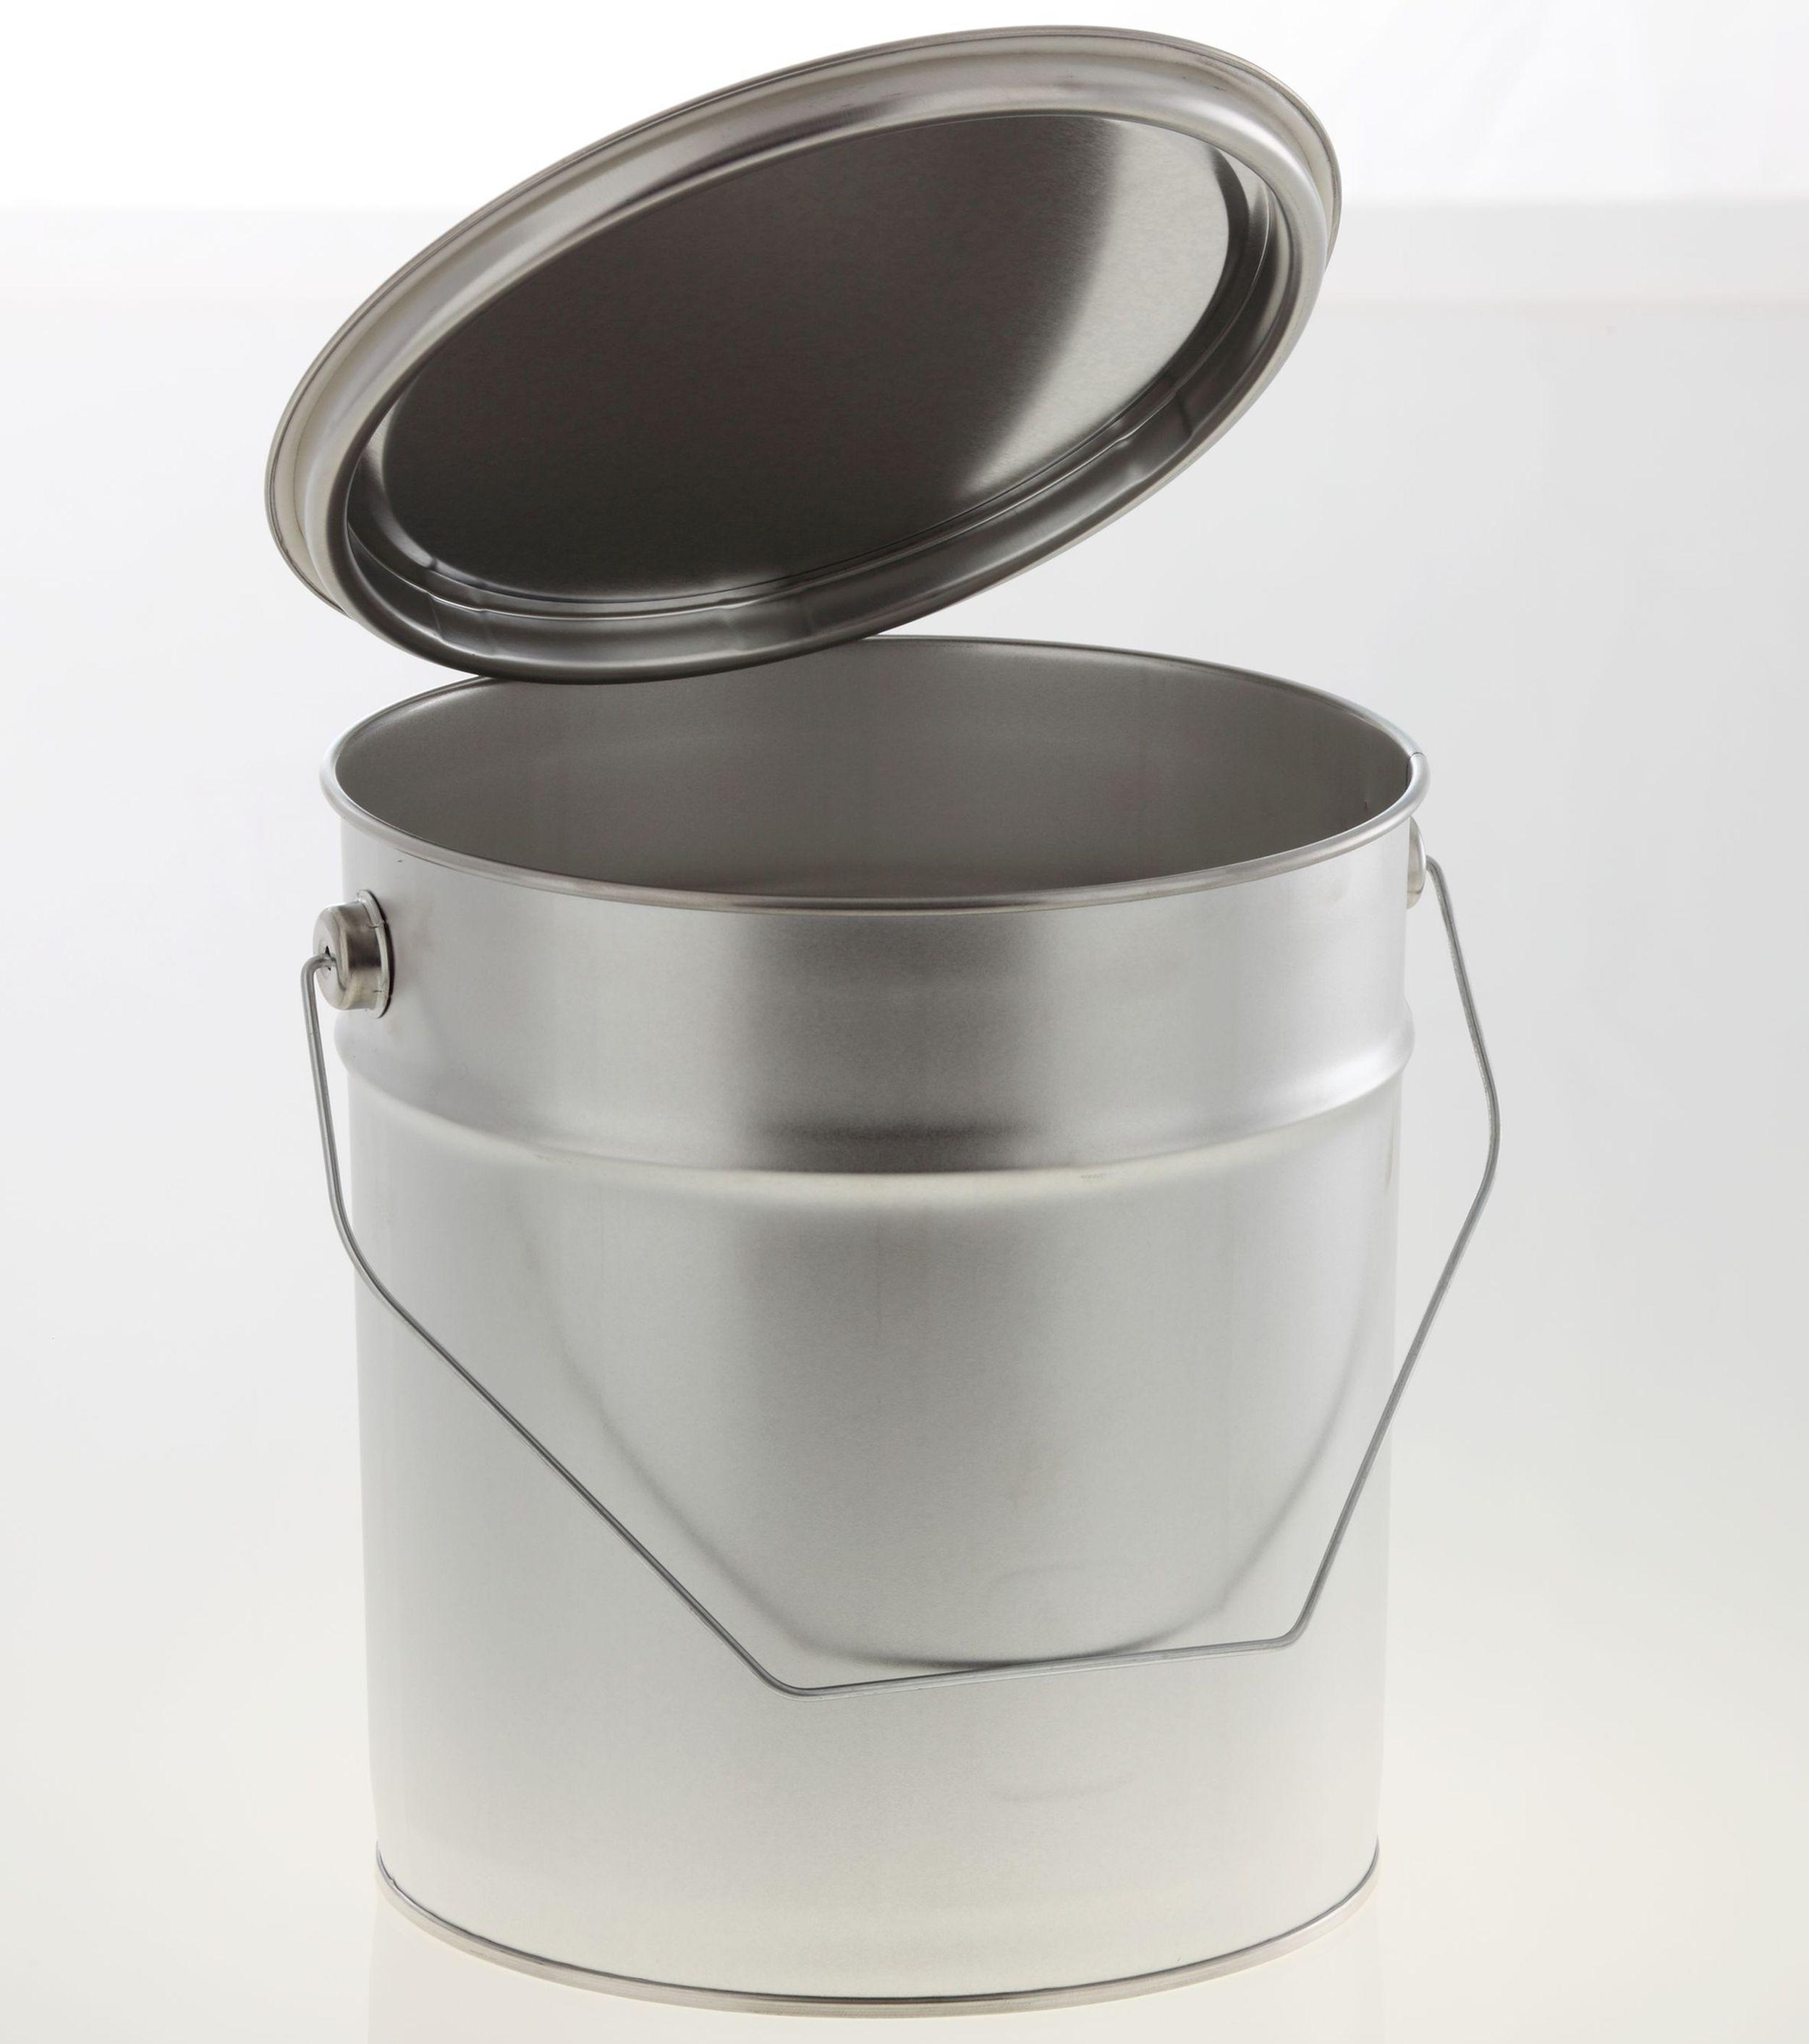 Metalleimer 3 Liter lebensmittelecht OHNE Spannring